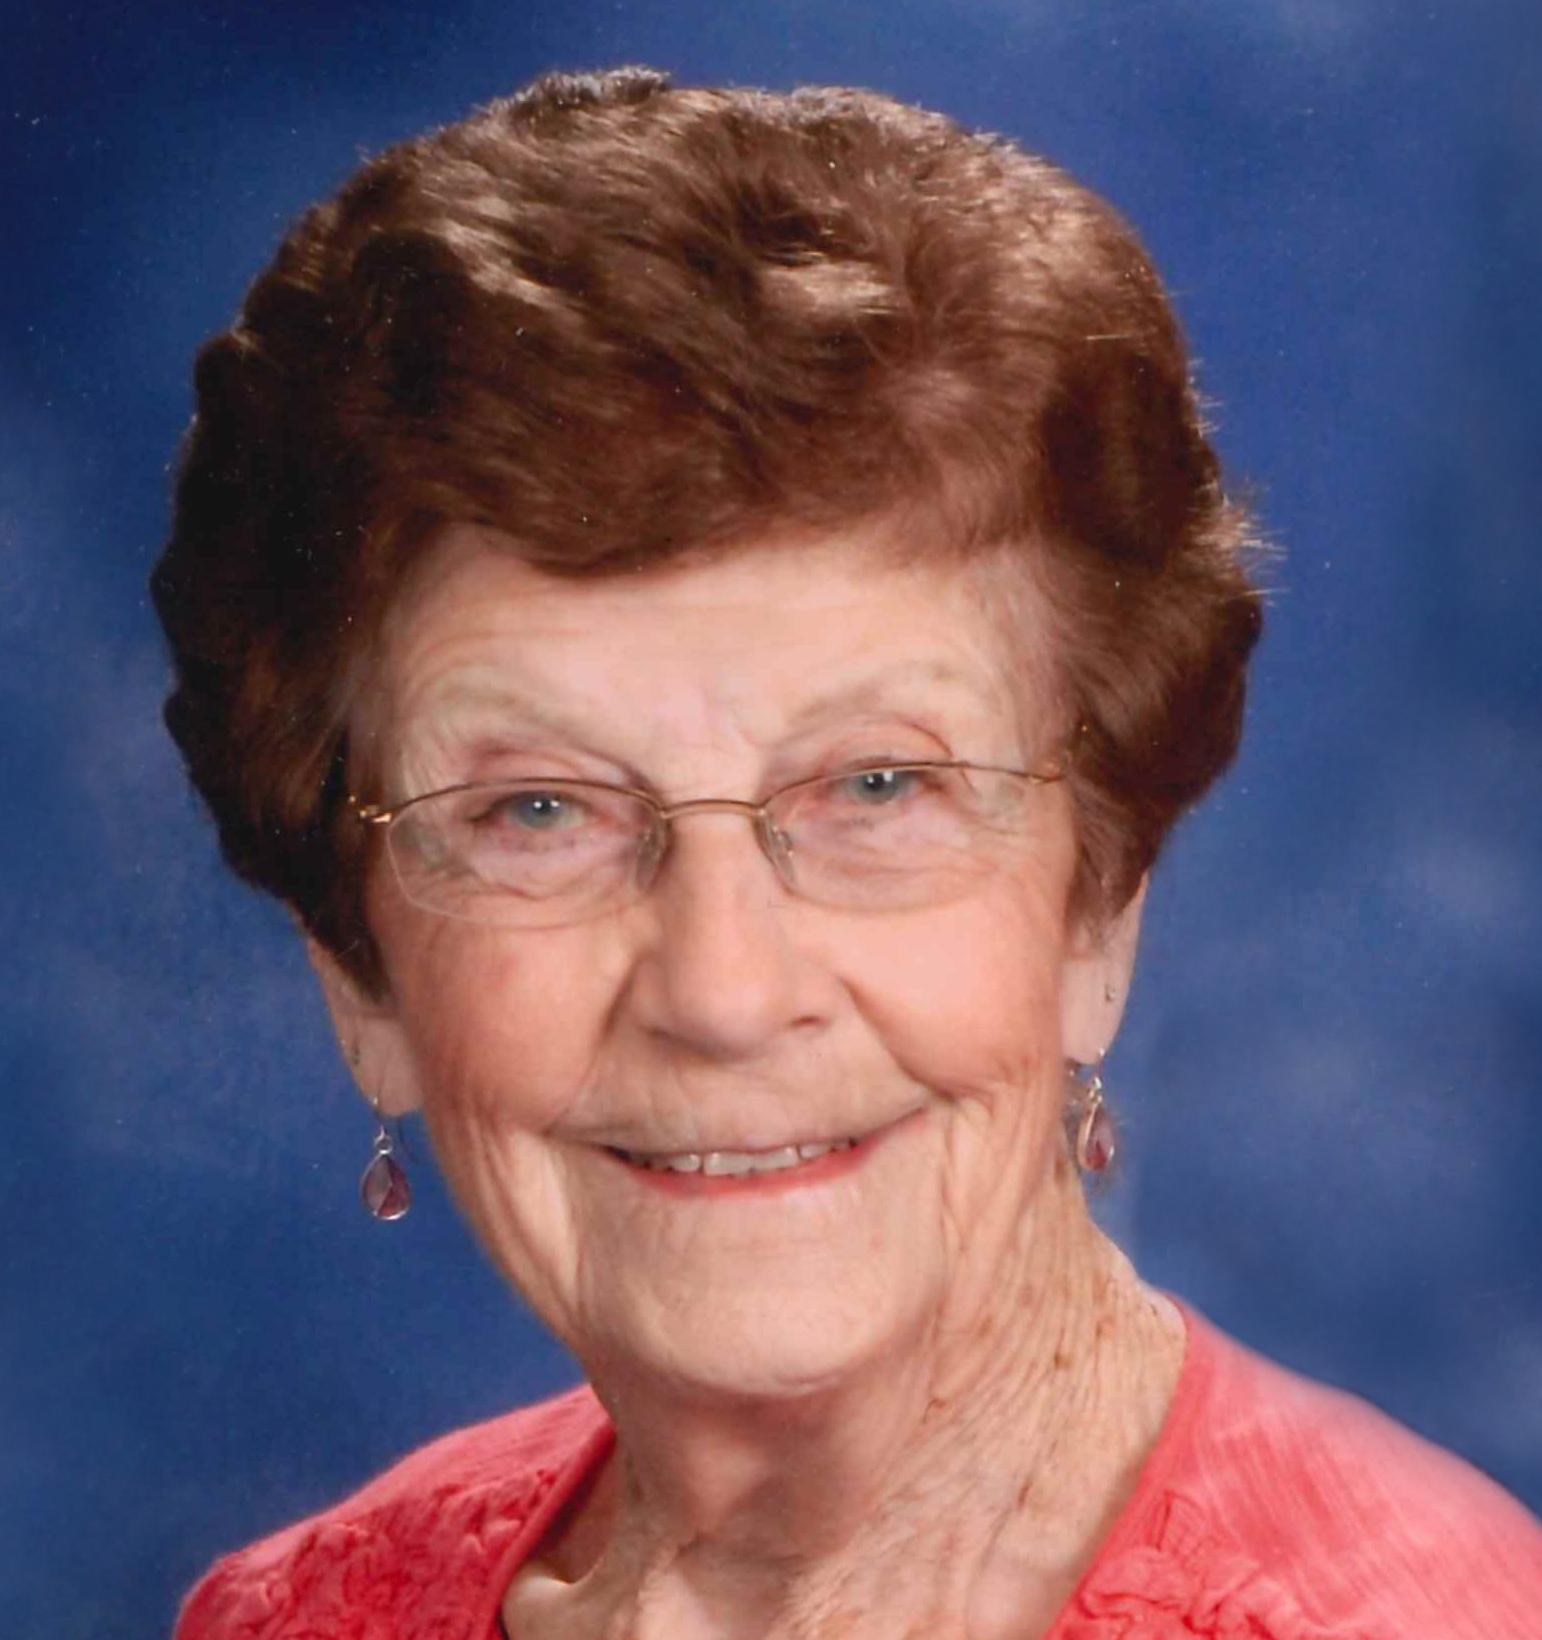 Roma Jean Mae Lofquist, 88 years of age, of rural Bertrand, Nebraska